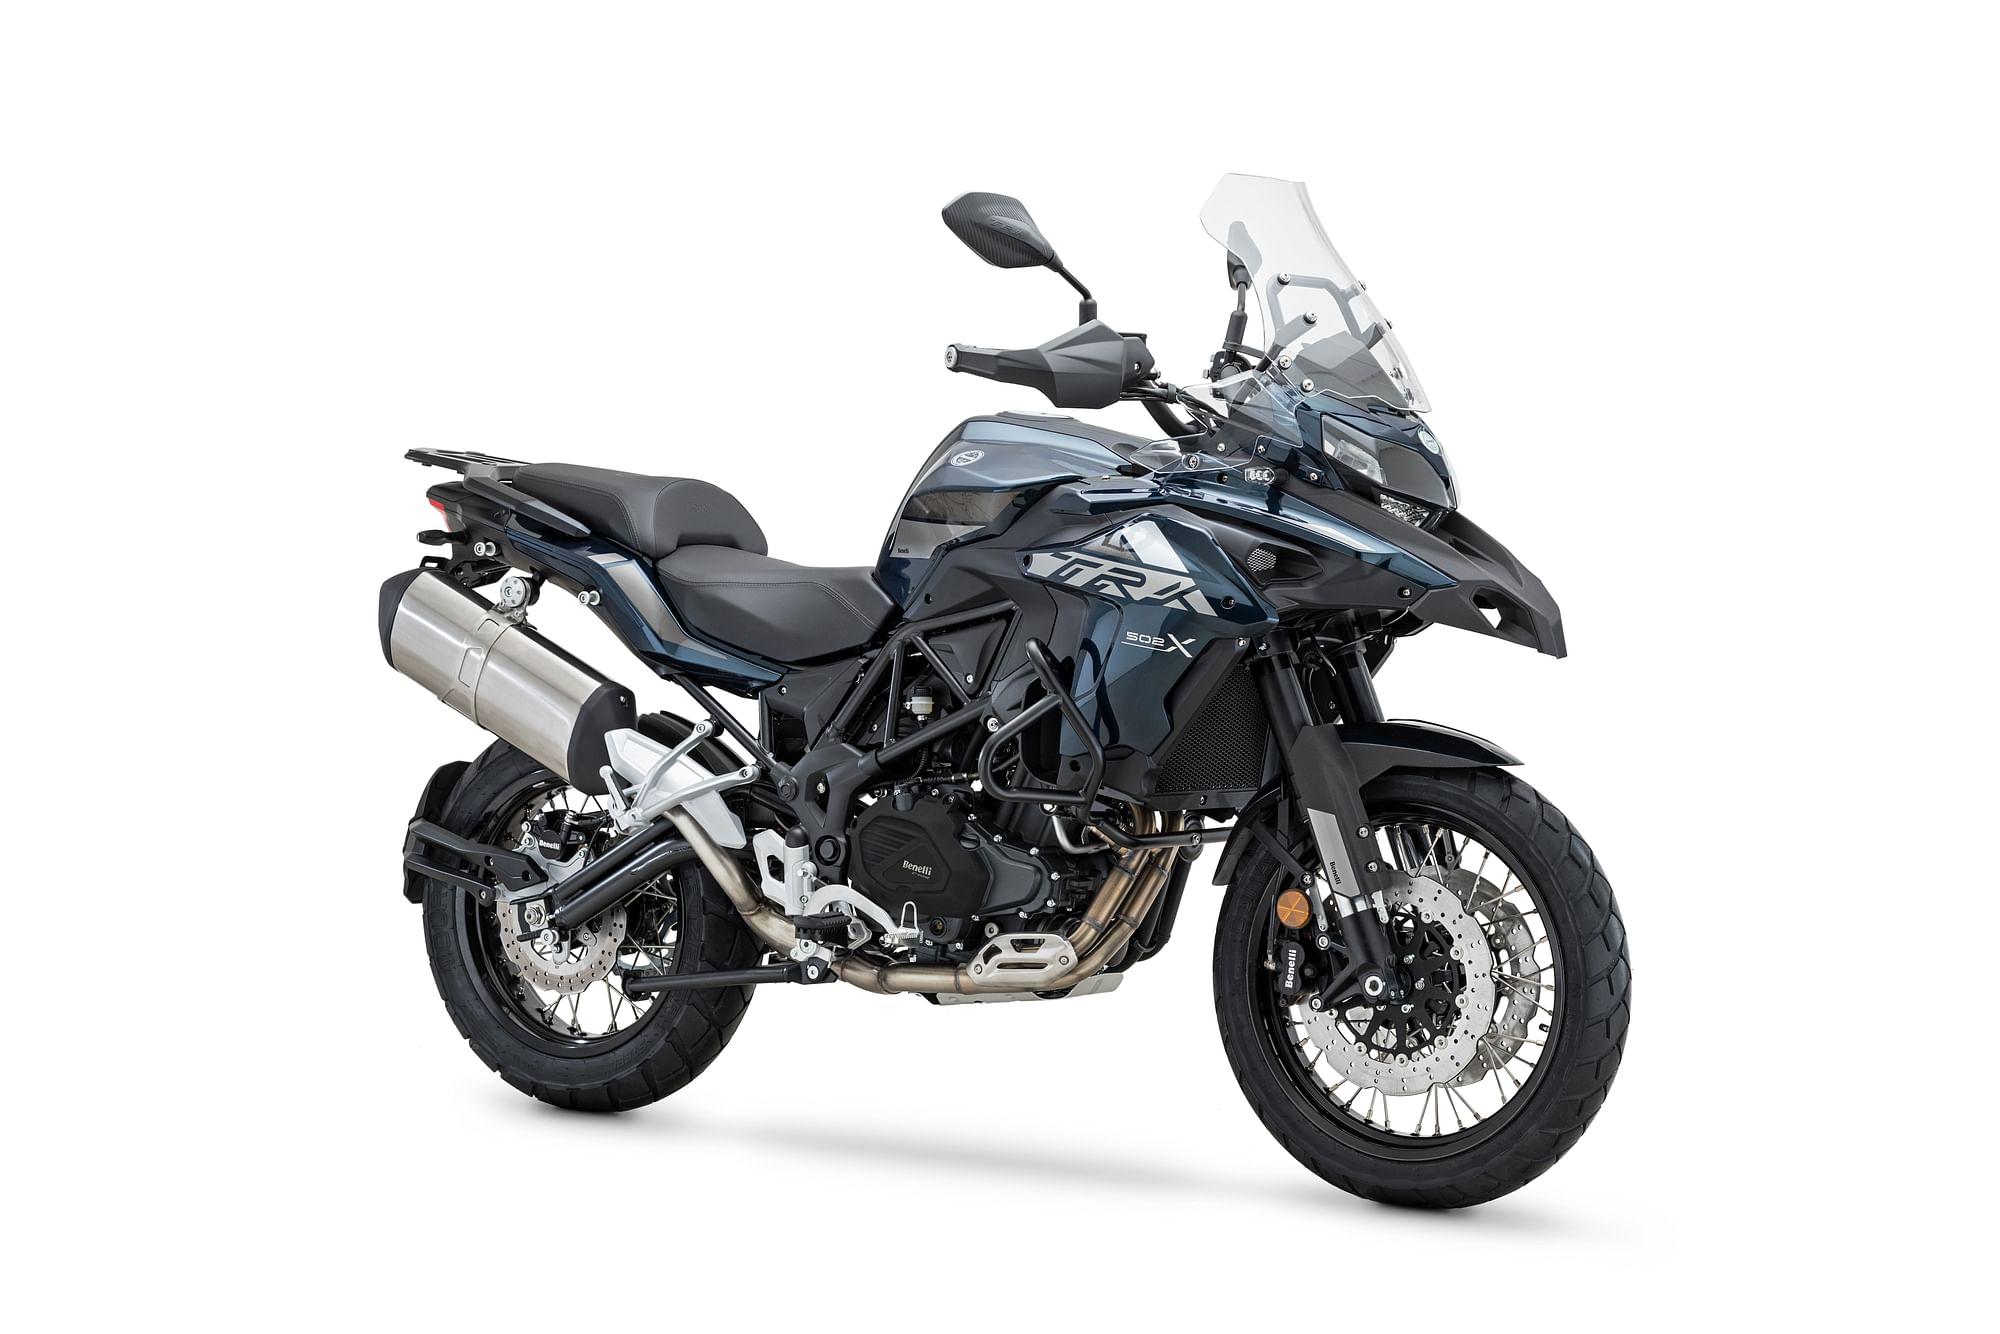 2019 TRK 502 X ABS Benelli Adventure Bike Review Specs